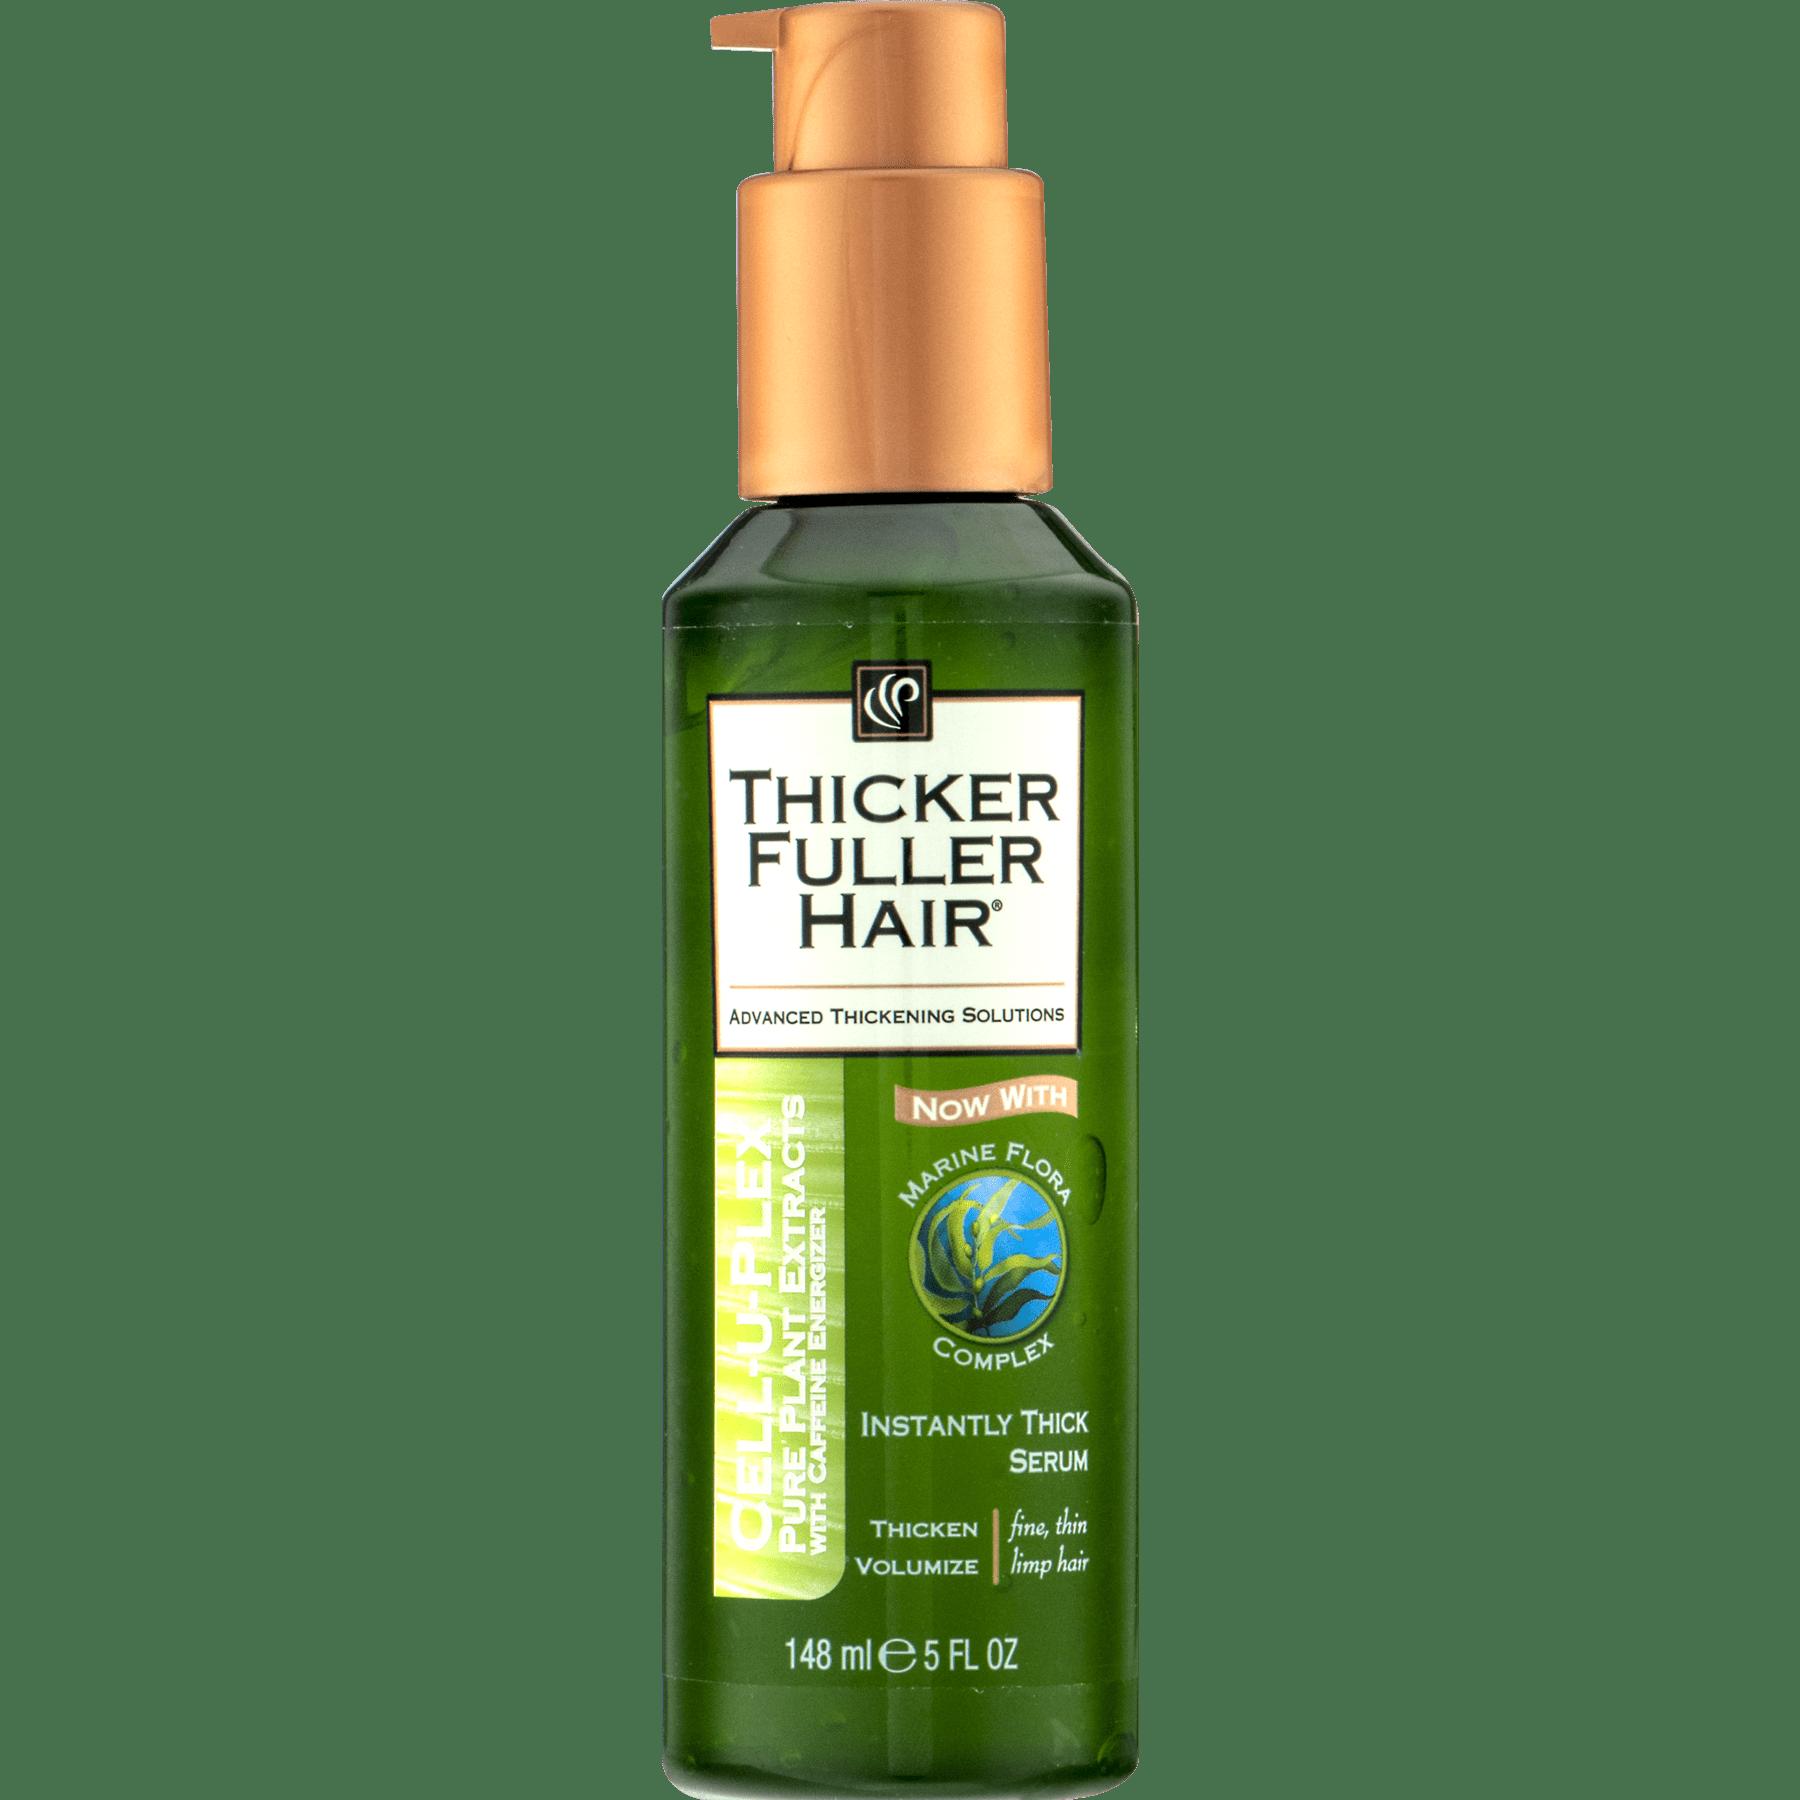 Thicker Fuller Hair Instantly Thick Hair Serum 5 Fl Oz Walmart